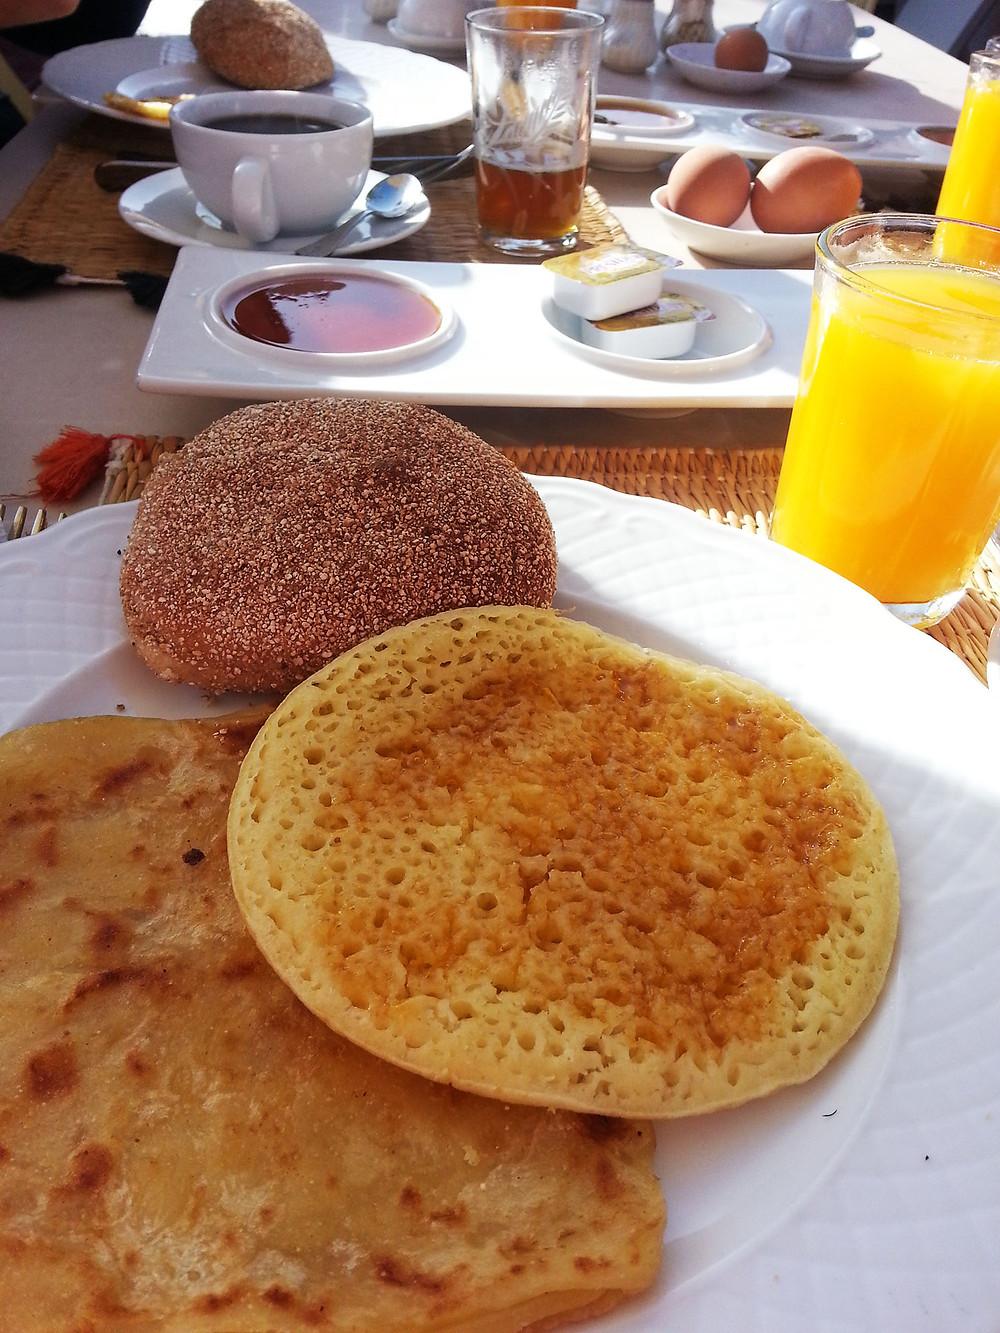 Petit déjeuner made in Maroc